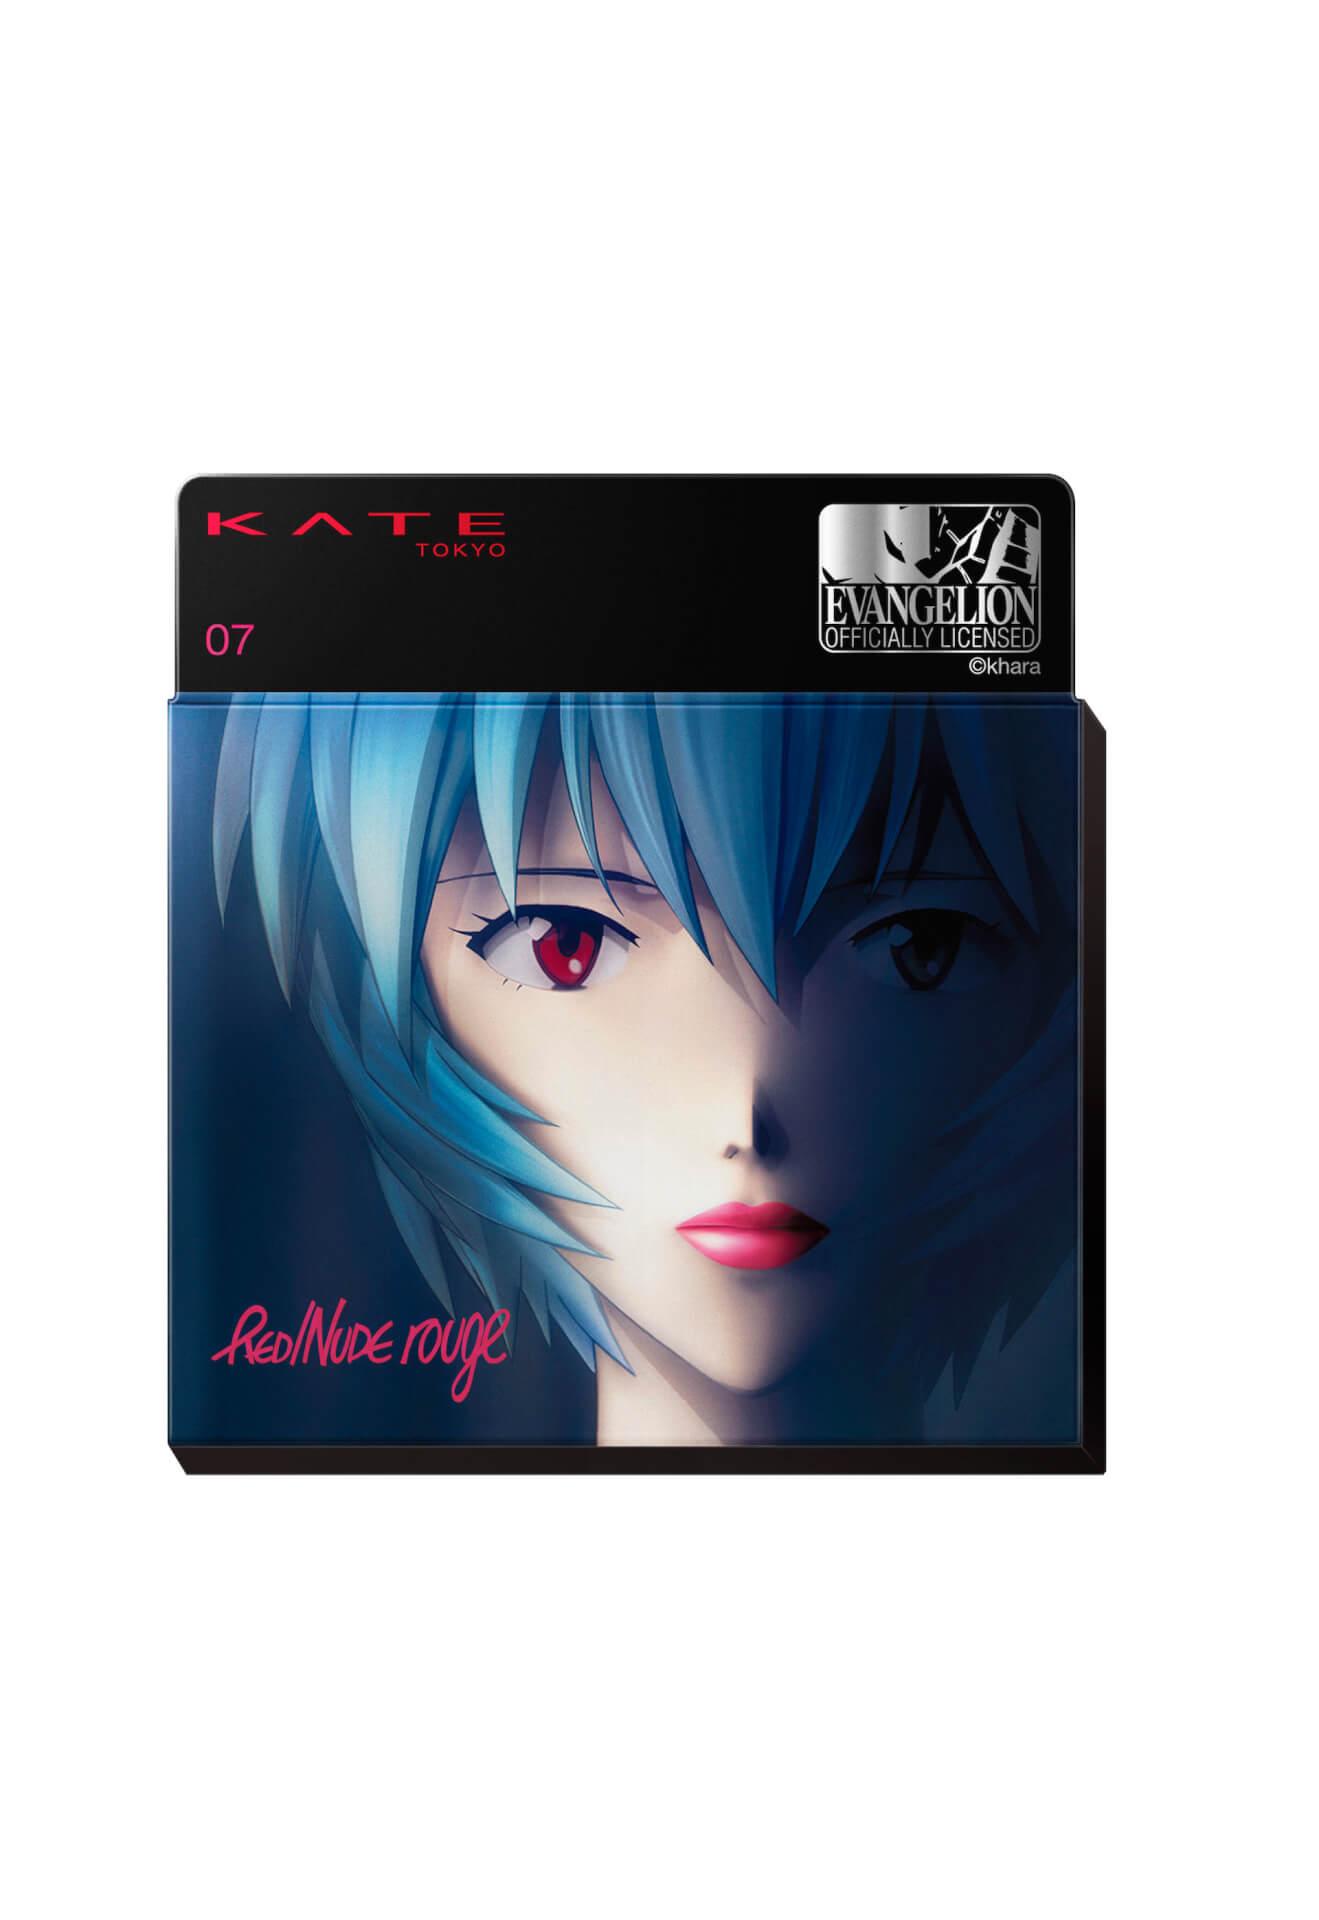 KATEが『エヴァンゲリオン』とコラボ!見たことのない綾波レイの姿が描かれた限定パッケージ発売決定 art201008_eva_kate_11